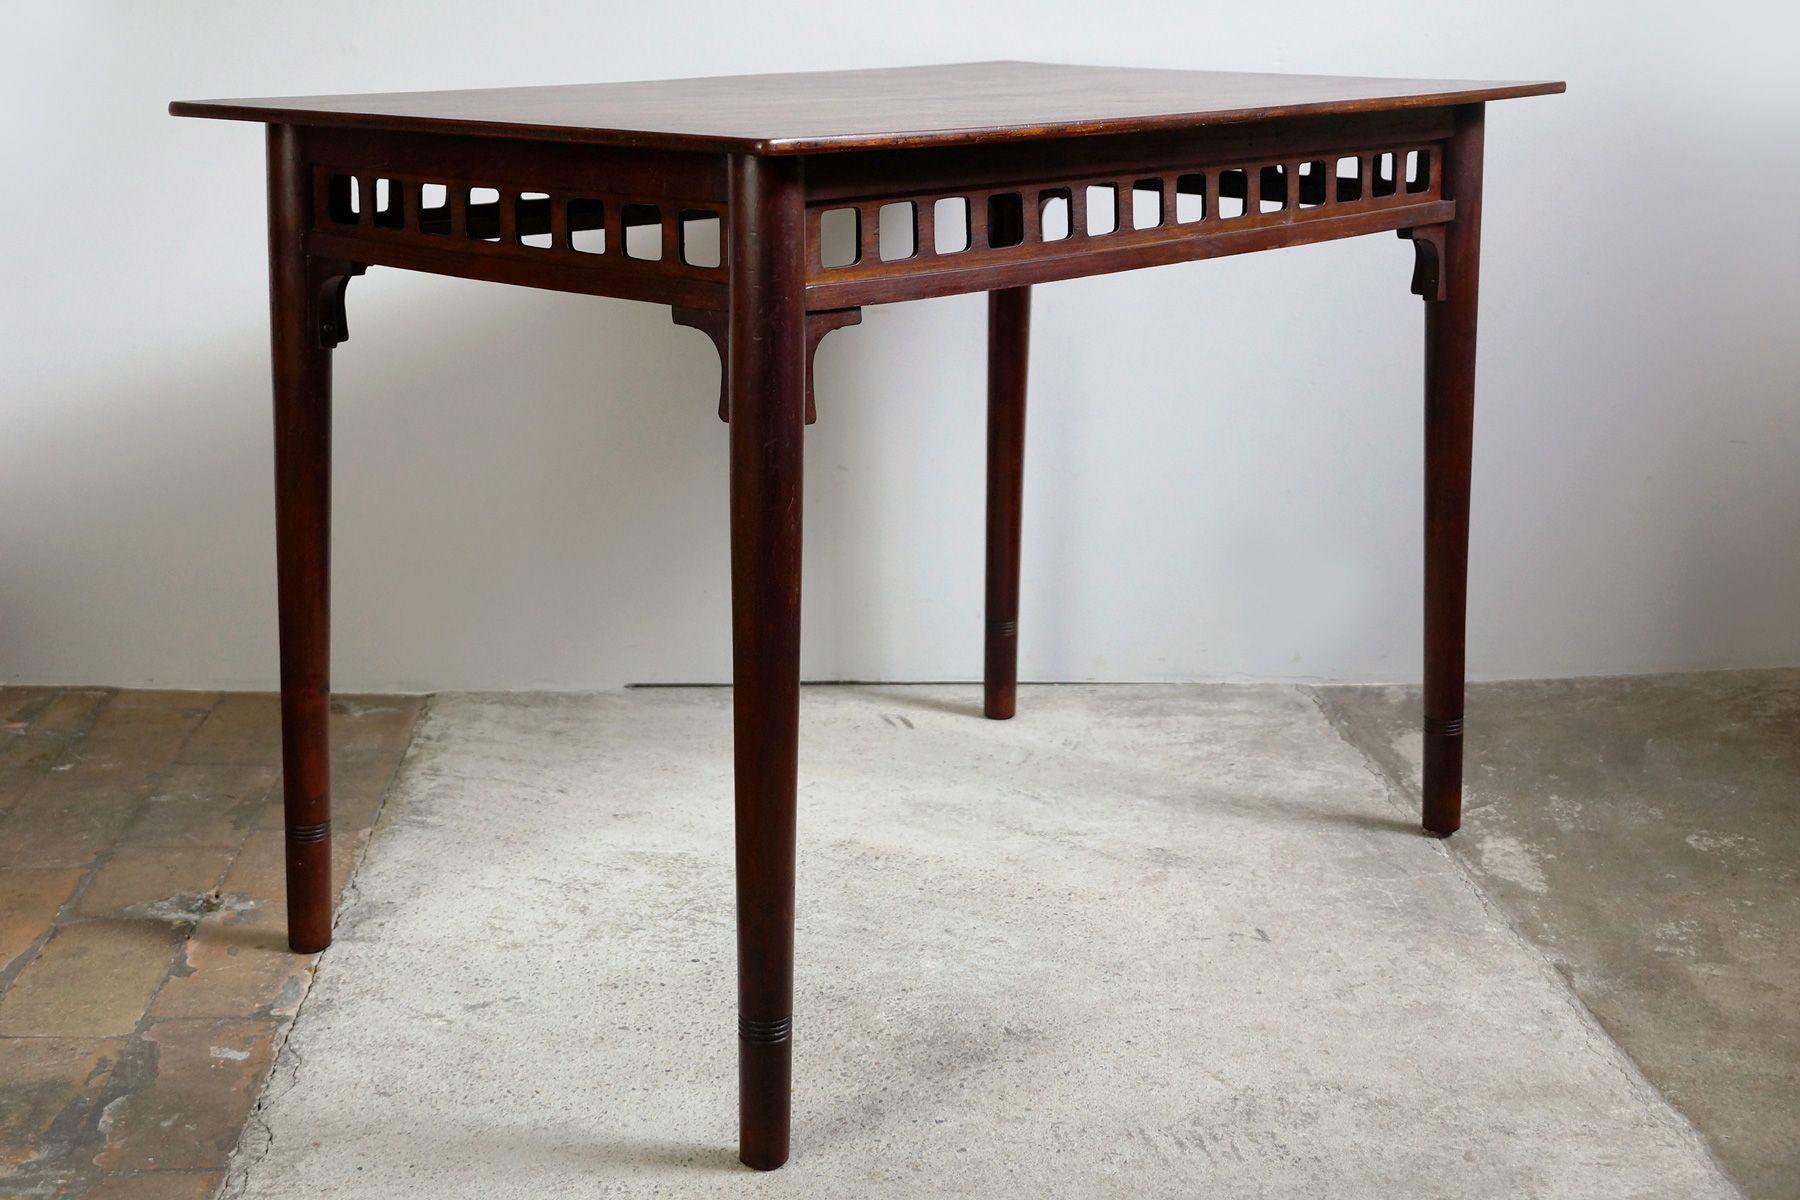 Vente Josef Kohn Table De Jacobamp; Sur PamonoArt Antique Basse En N8PXnwOk0